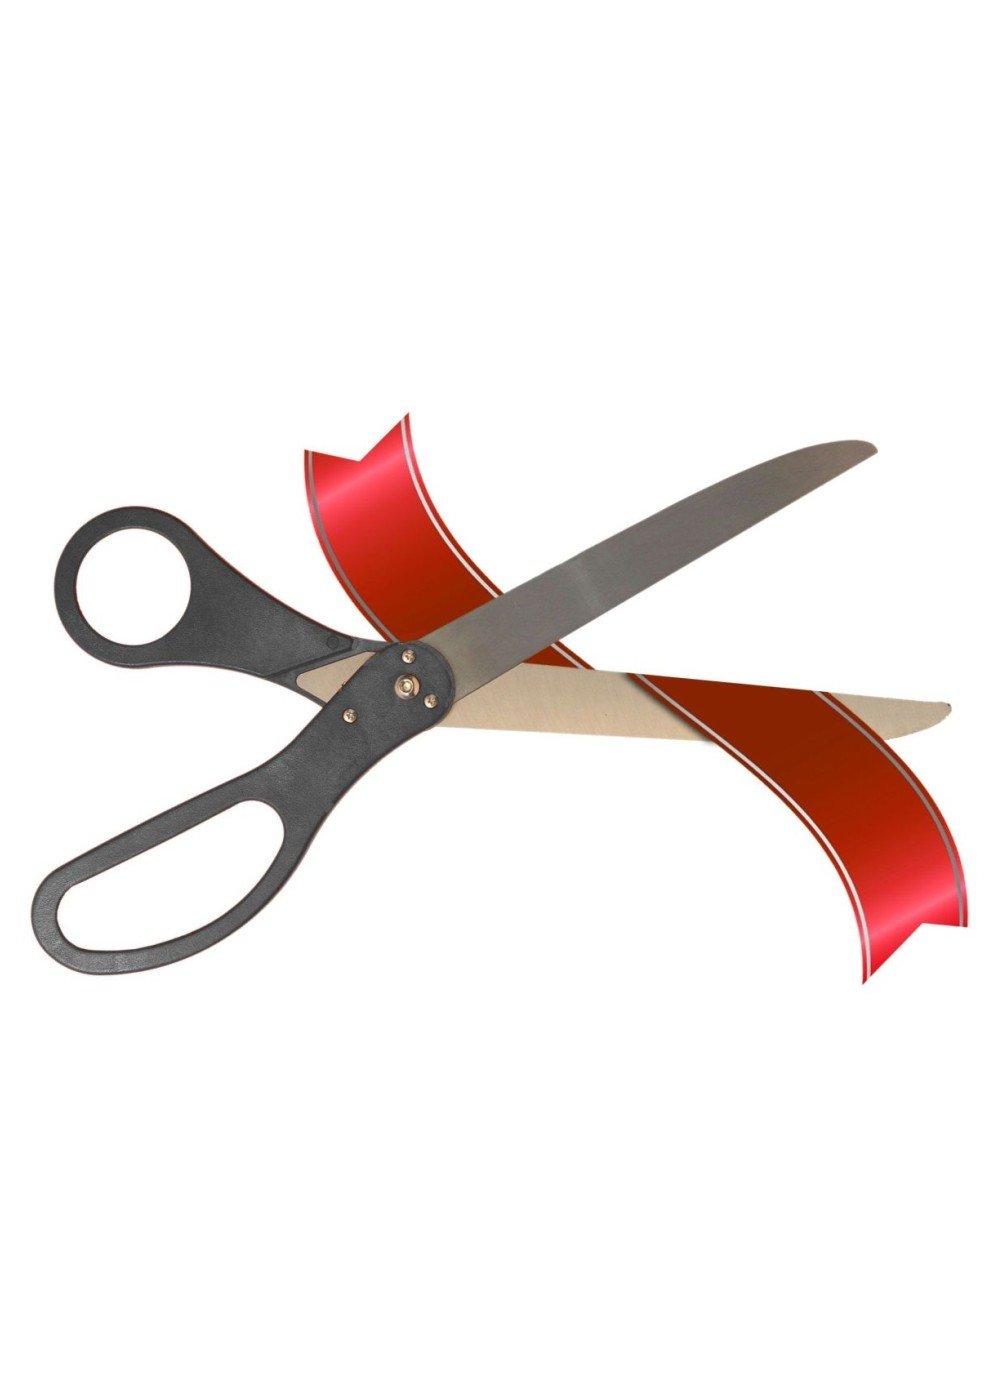 25 Inch Black Ribbon Cutting Scissors by Wonder Costumes